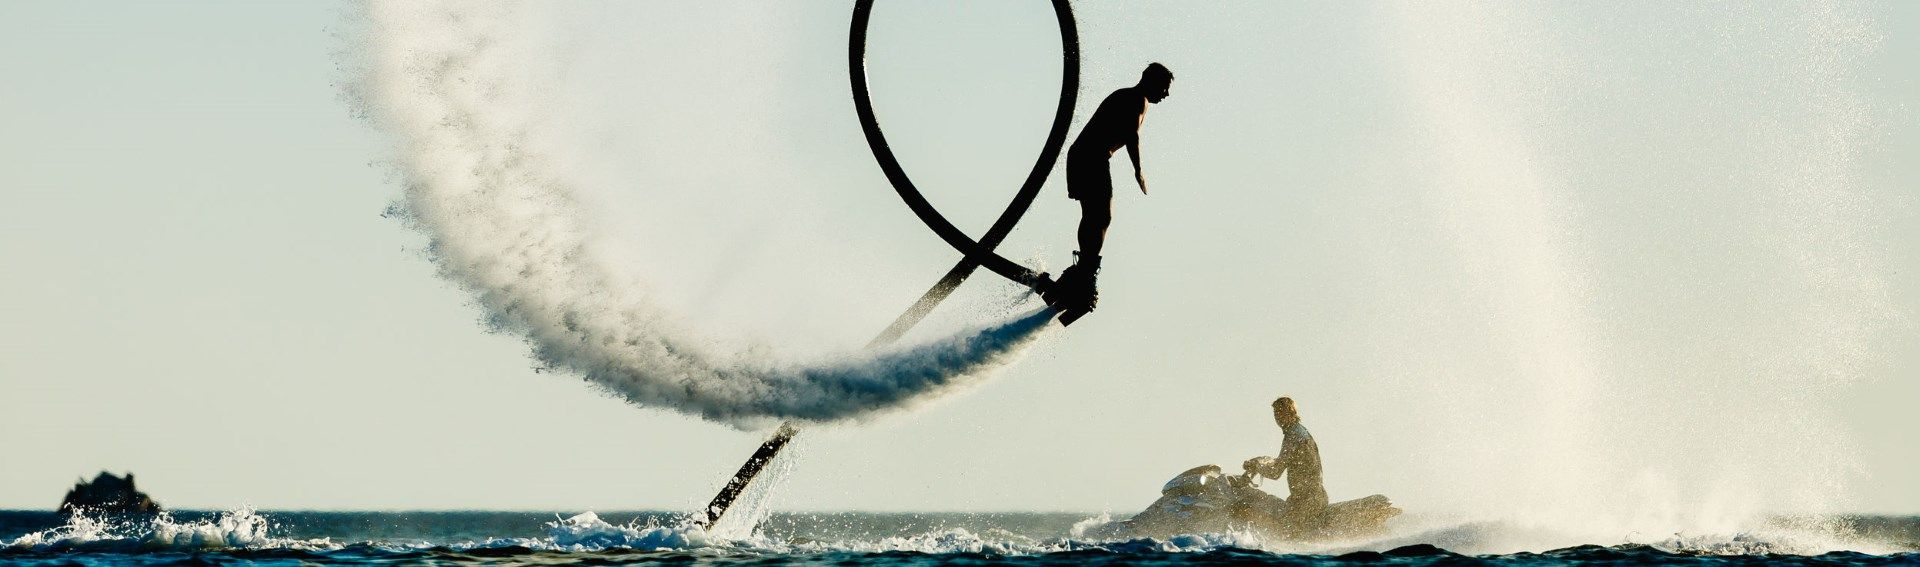 Flyboard Dubrovnik